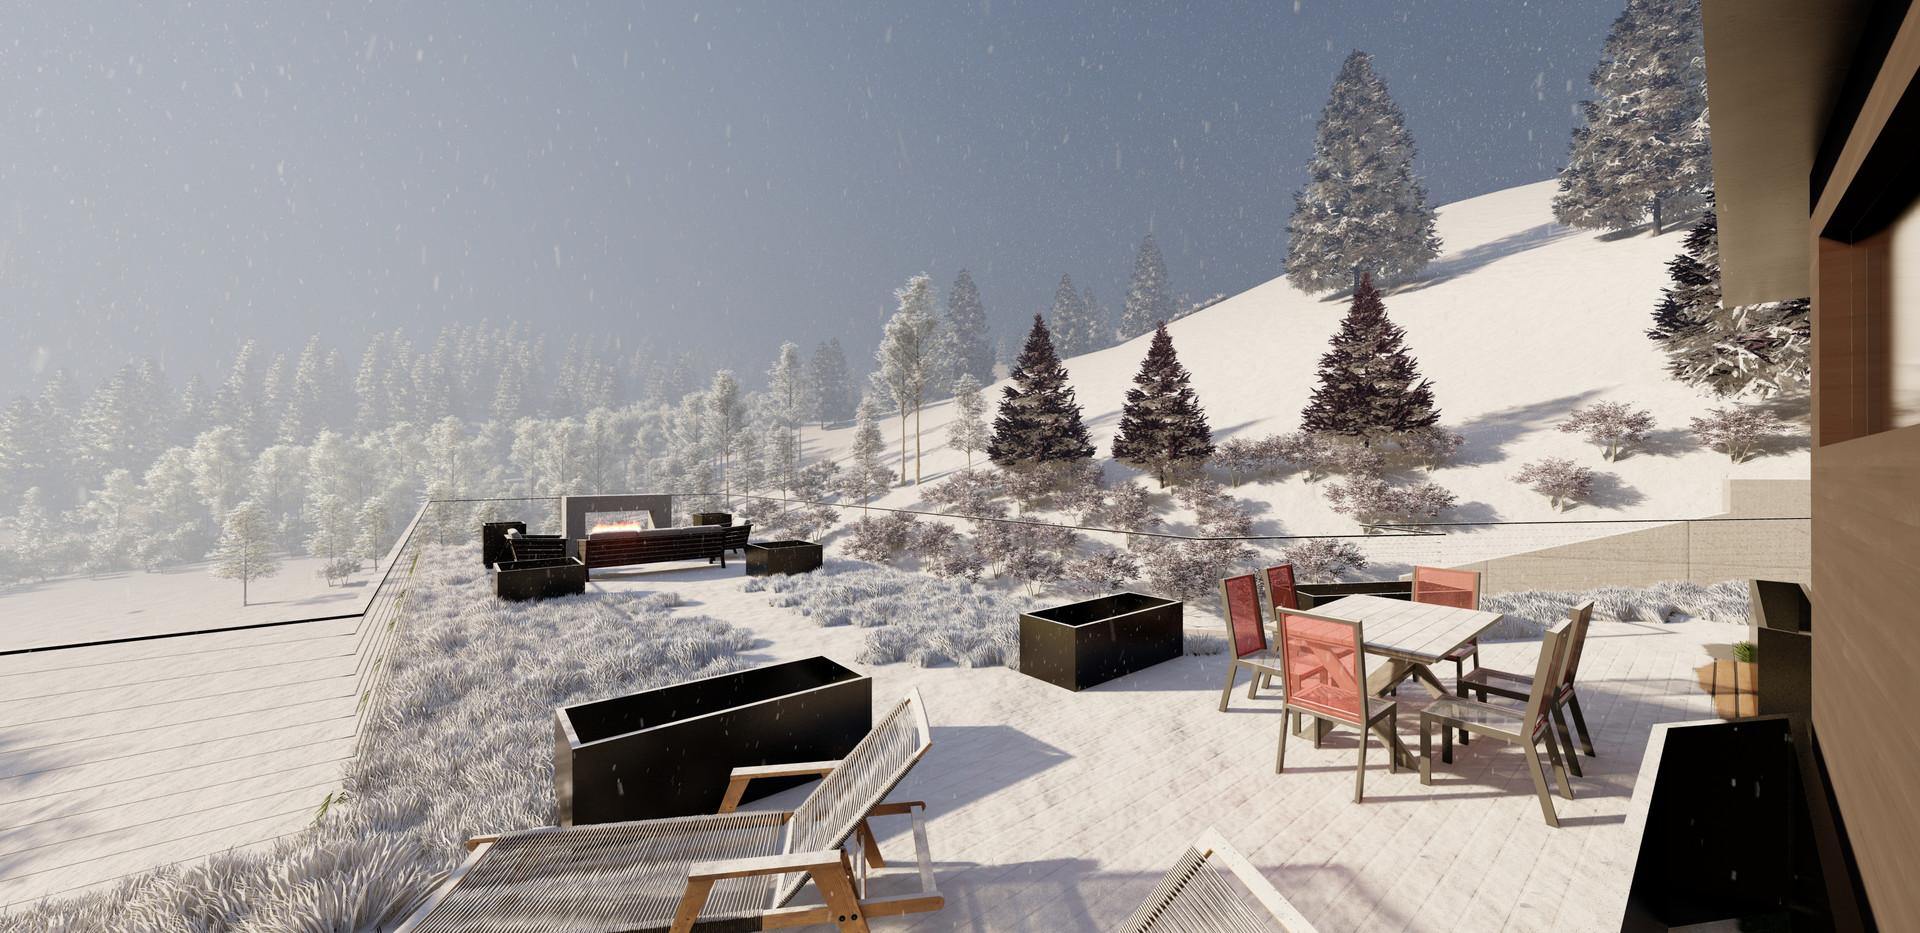 Creekside Terrace - Roof Deck in Snow.jp